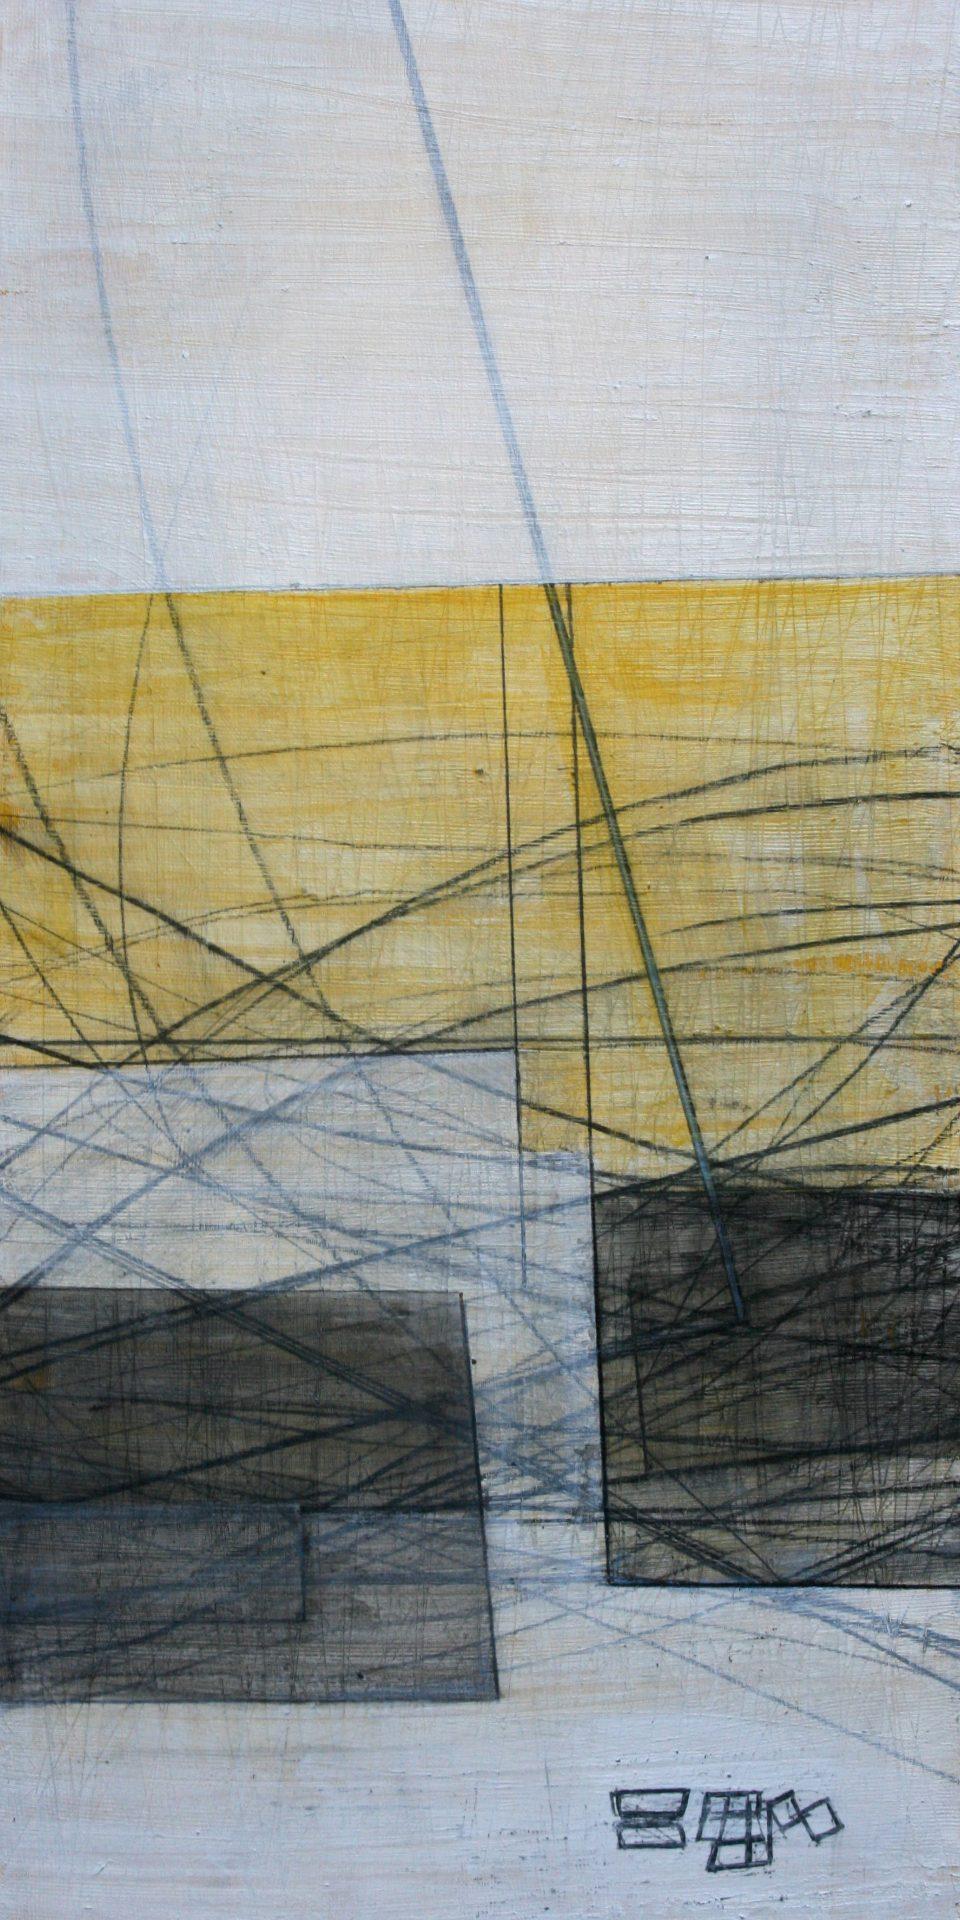 Bryan Boone work of art Frames Series